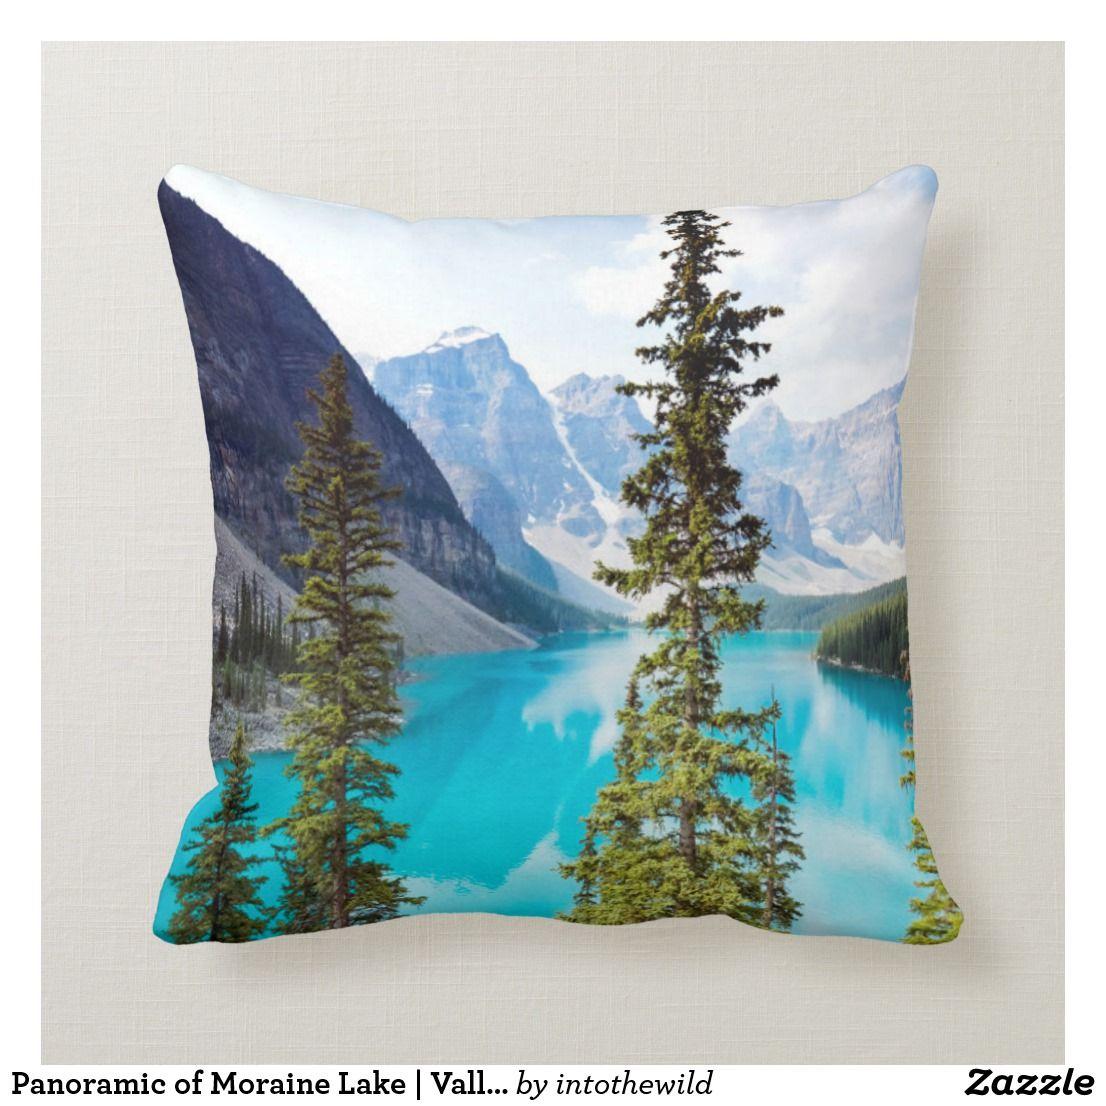 Panoramic Of Moraine Lake Valley Of Ten Peaks Throw Pillow Zazzle Com Throw Pillows Pillows Custom Pillows